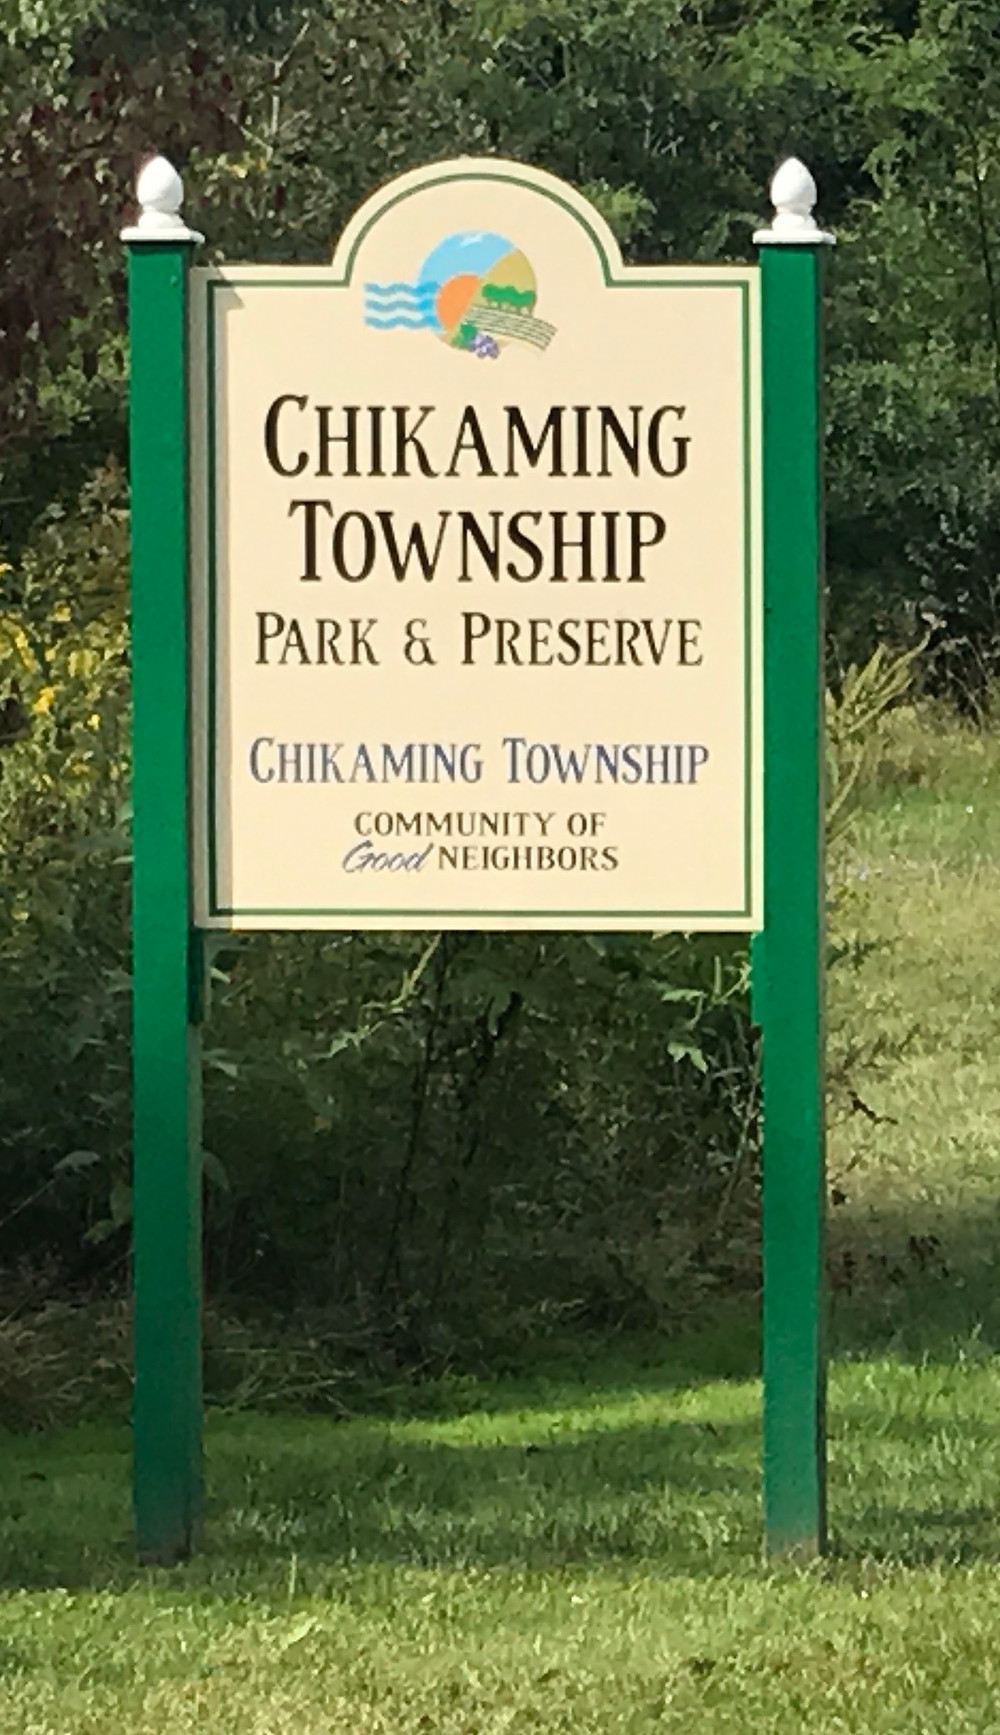 Sign: Chikaming Township Park & Preserve